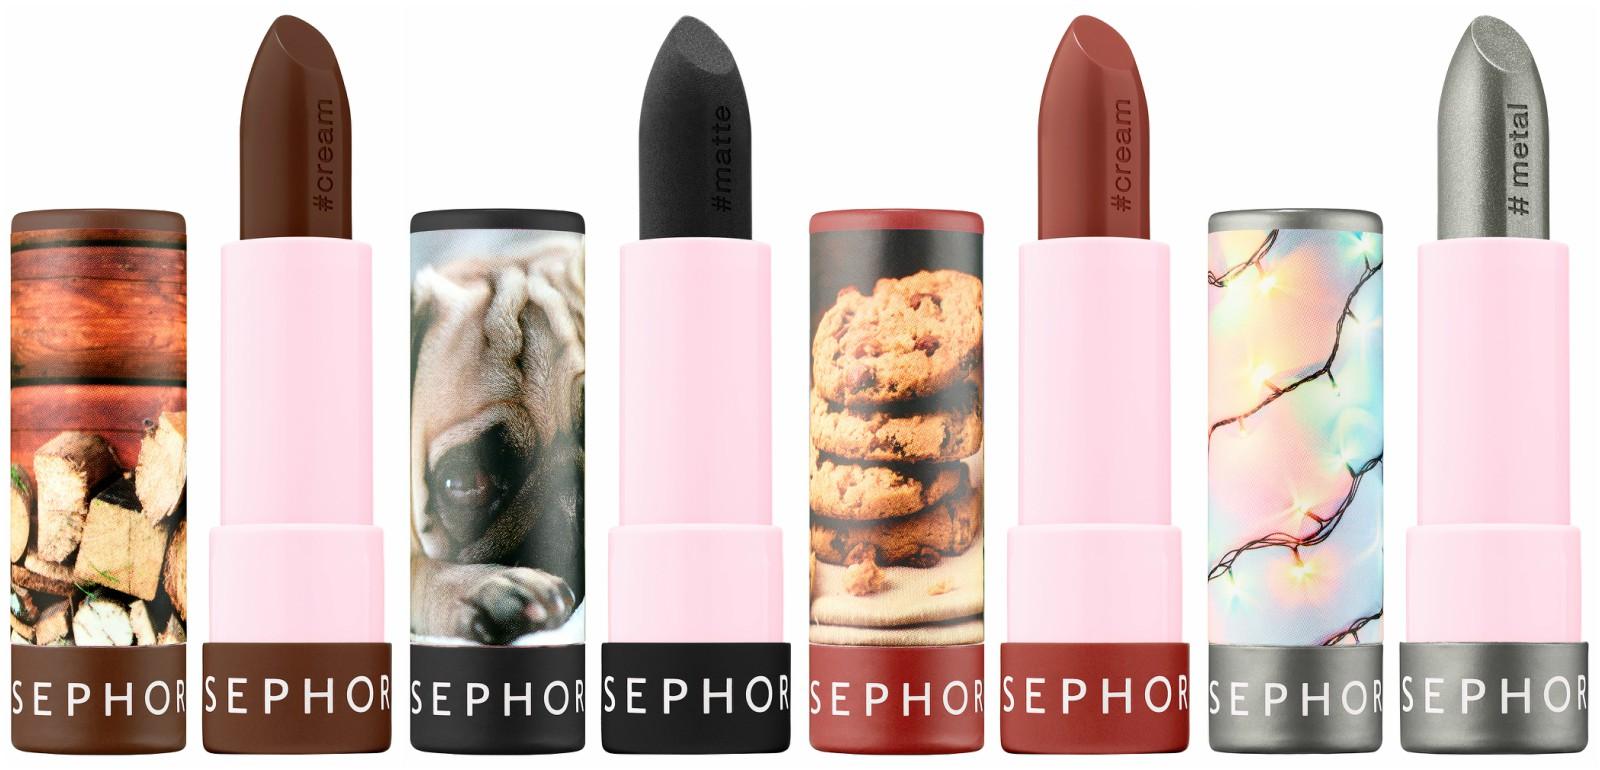 sephora lip stories dark shades photo